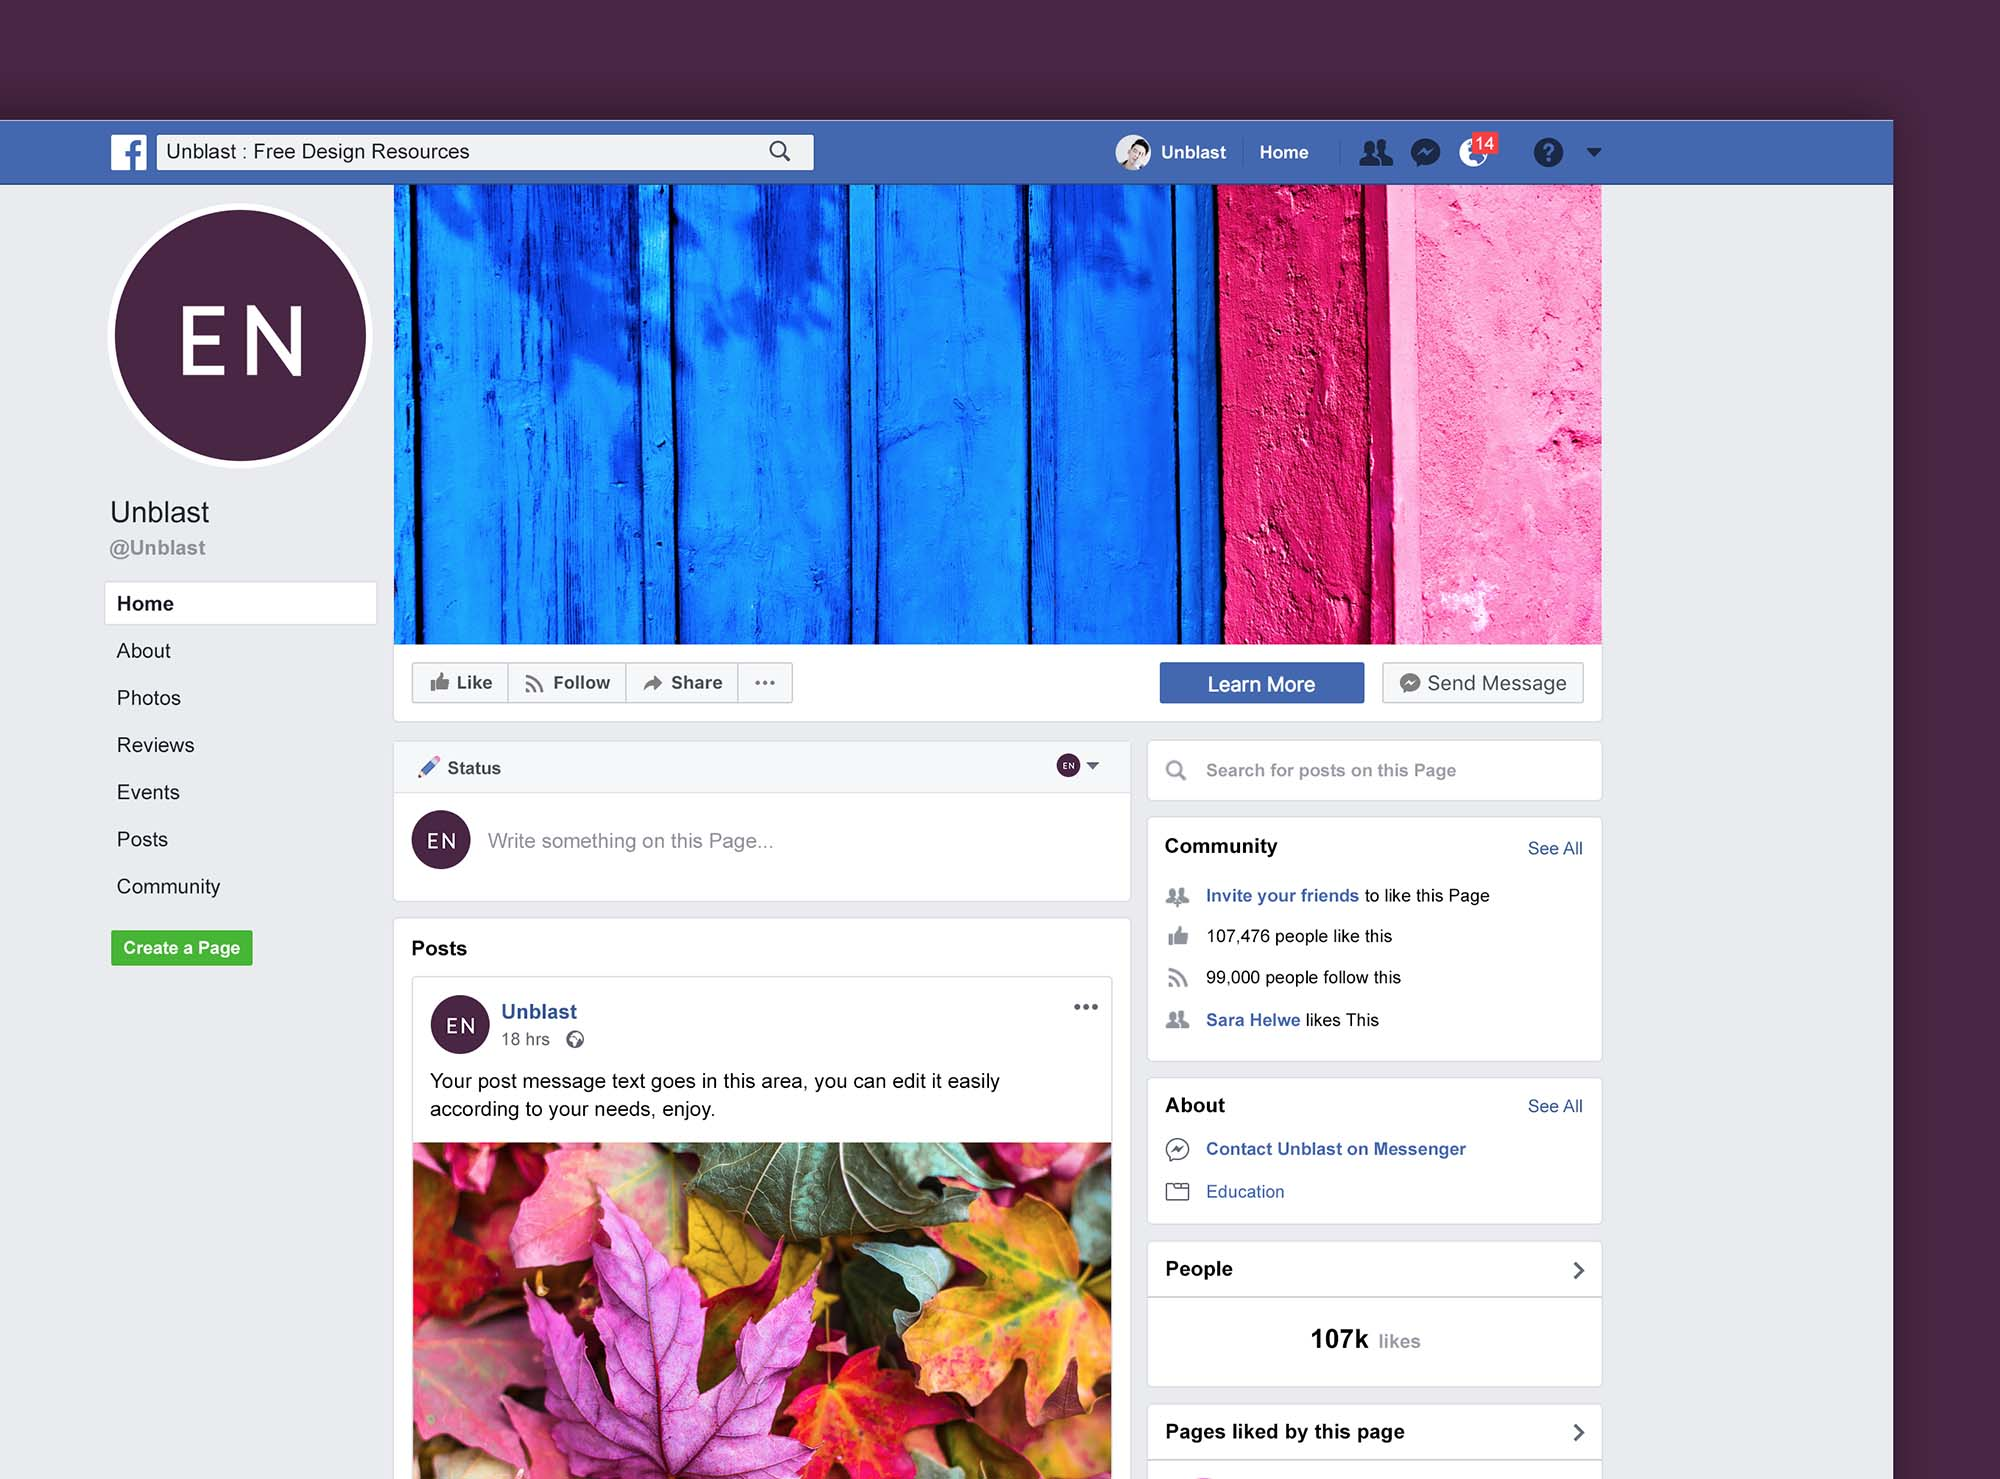 Facebook Page Mockup 2